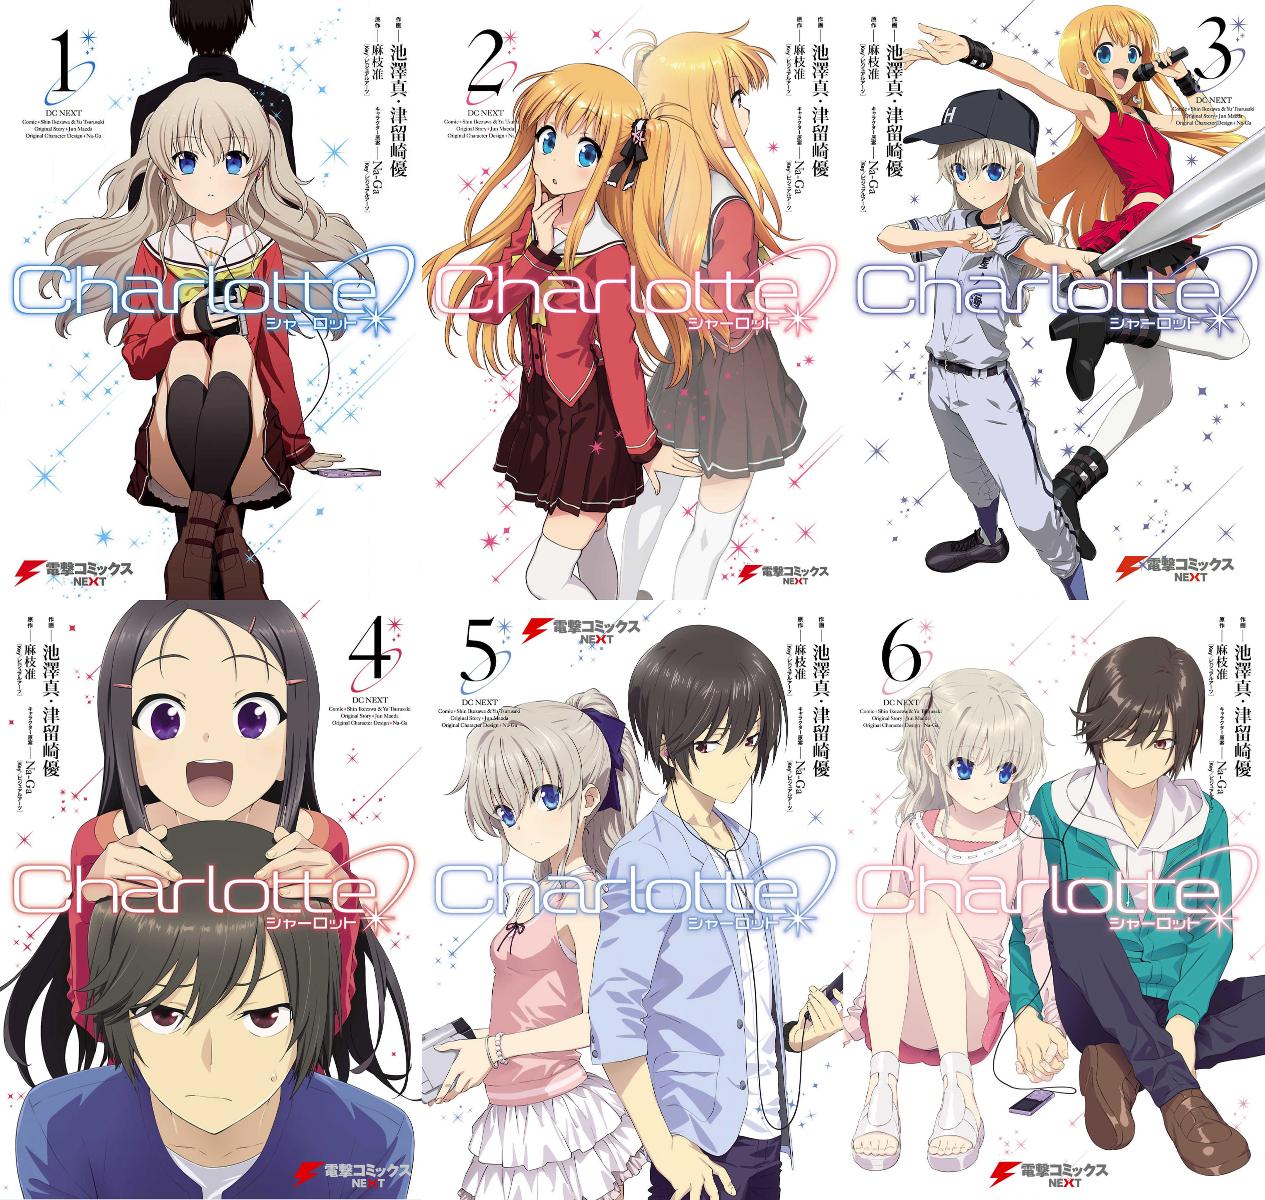 Charlotte manga has finished serialization